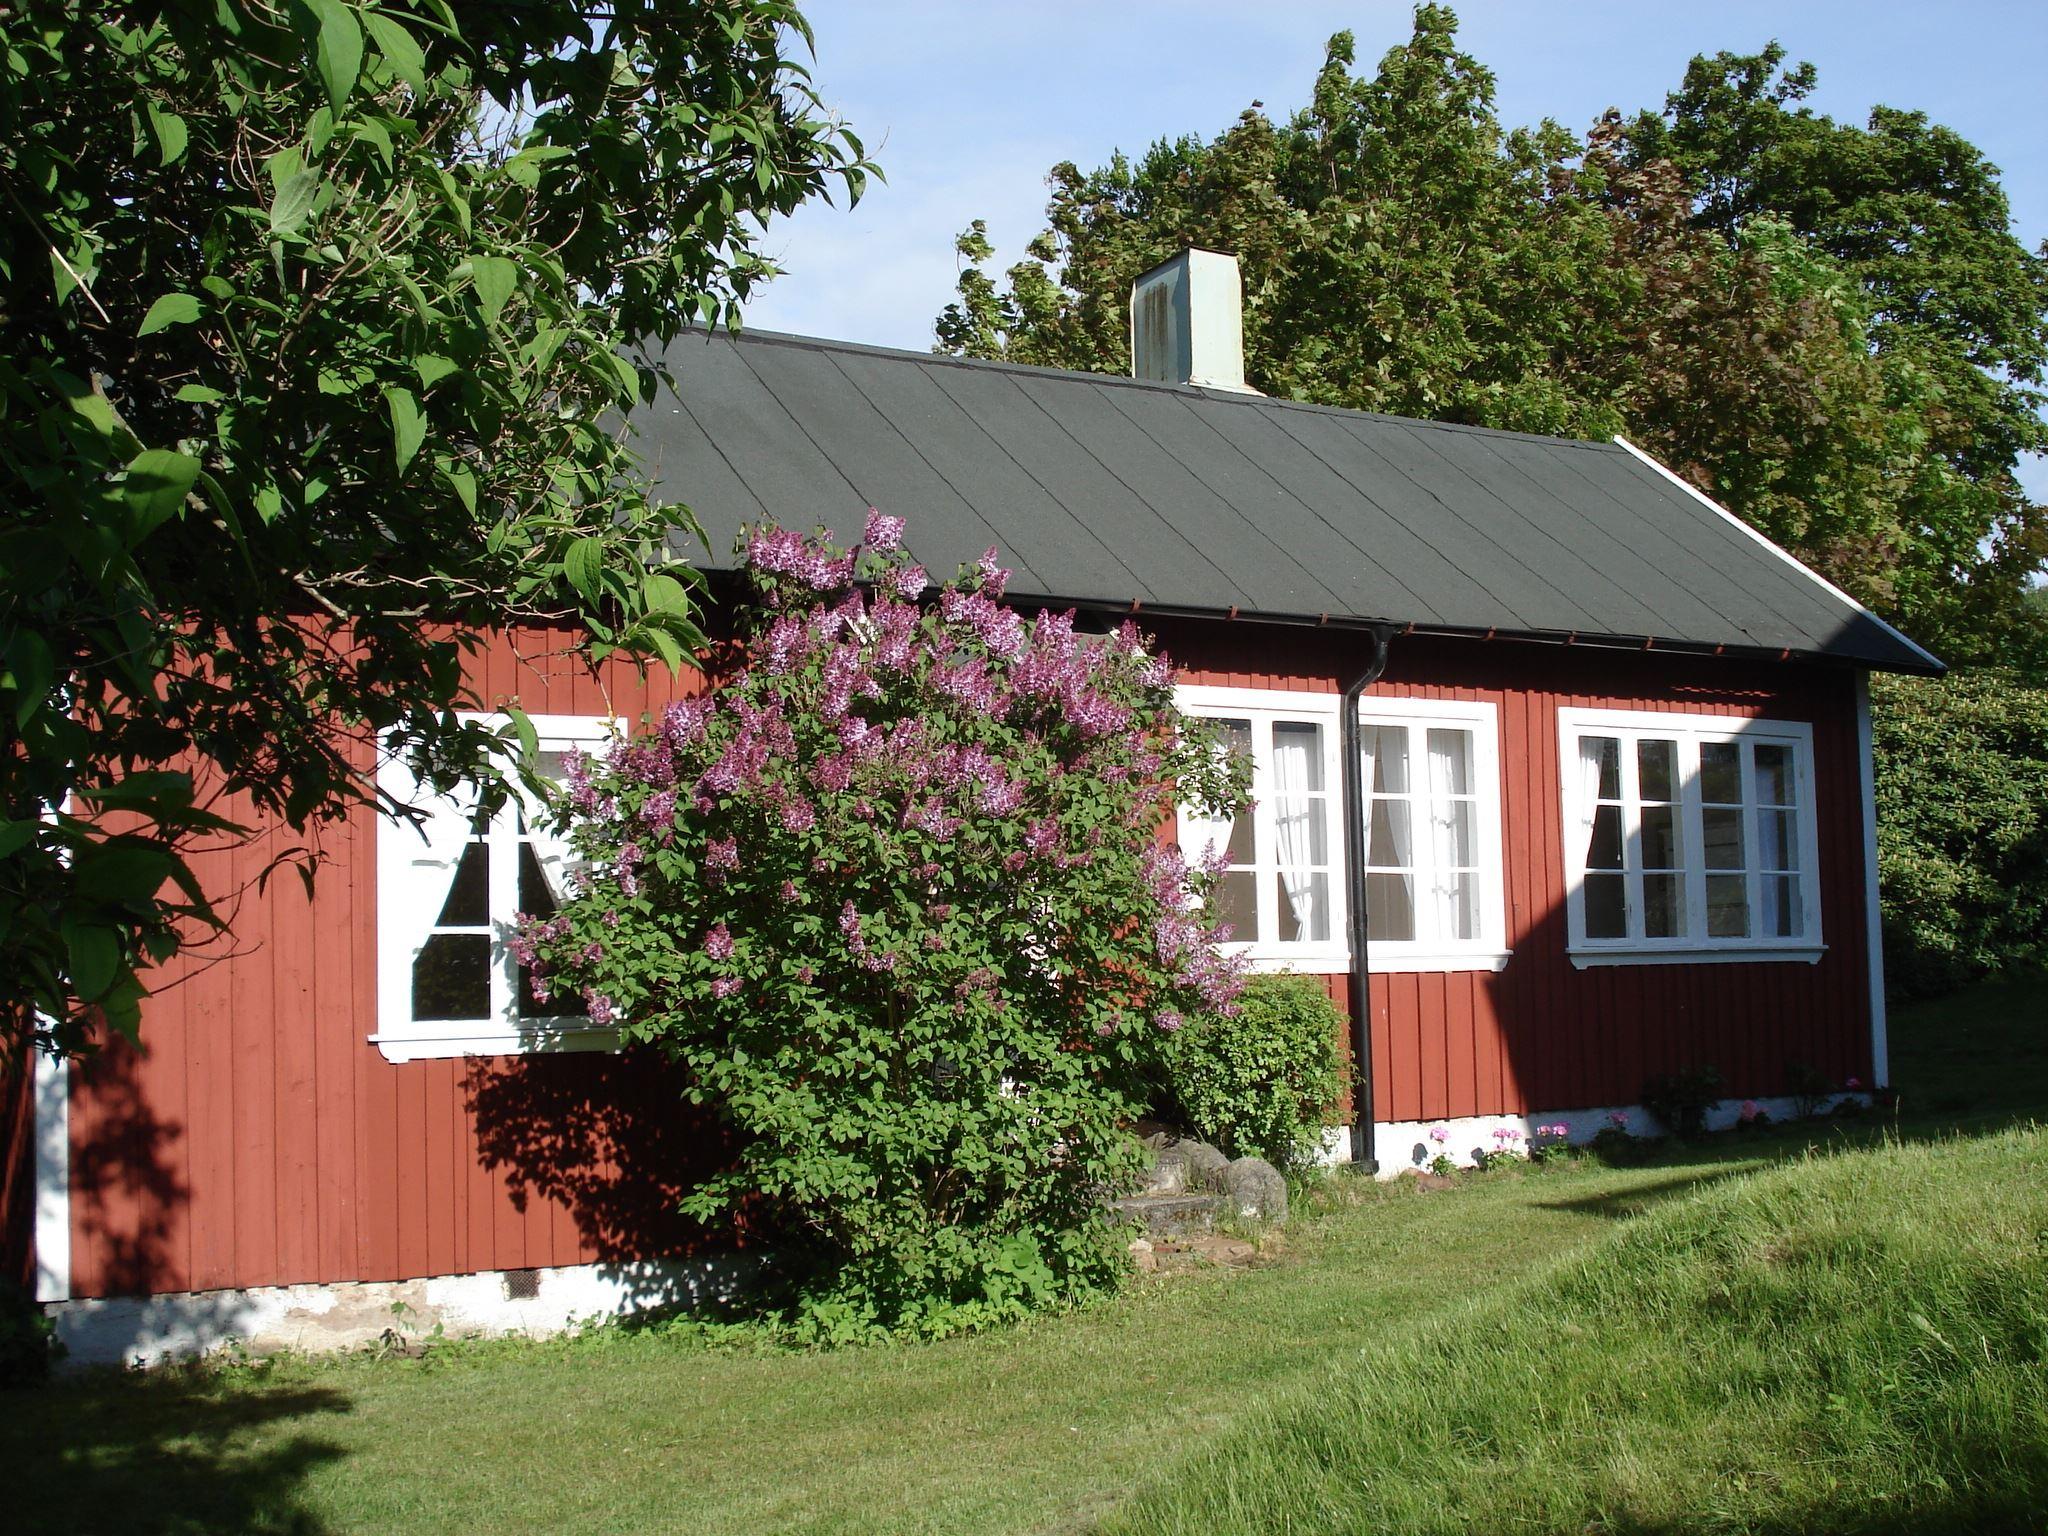 Homestay - Båstad(Catharina von Post Mannheimer)